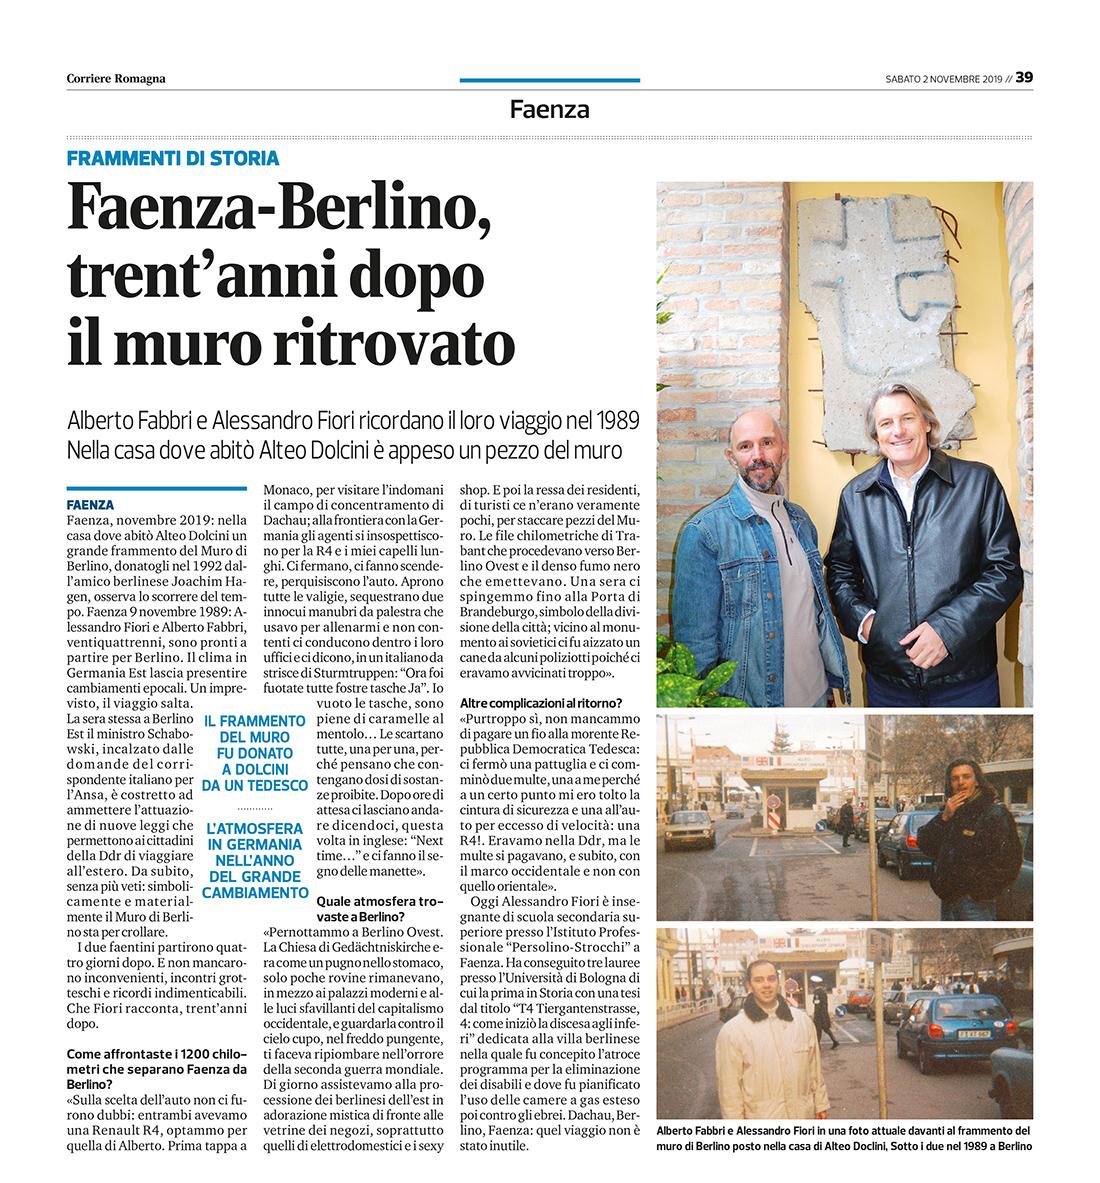 001_02_11_2019 Quotidiano NG 0211 cronaca 39 Faenza Ravenna-Imola